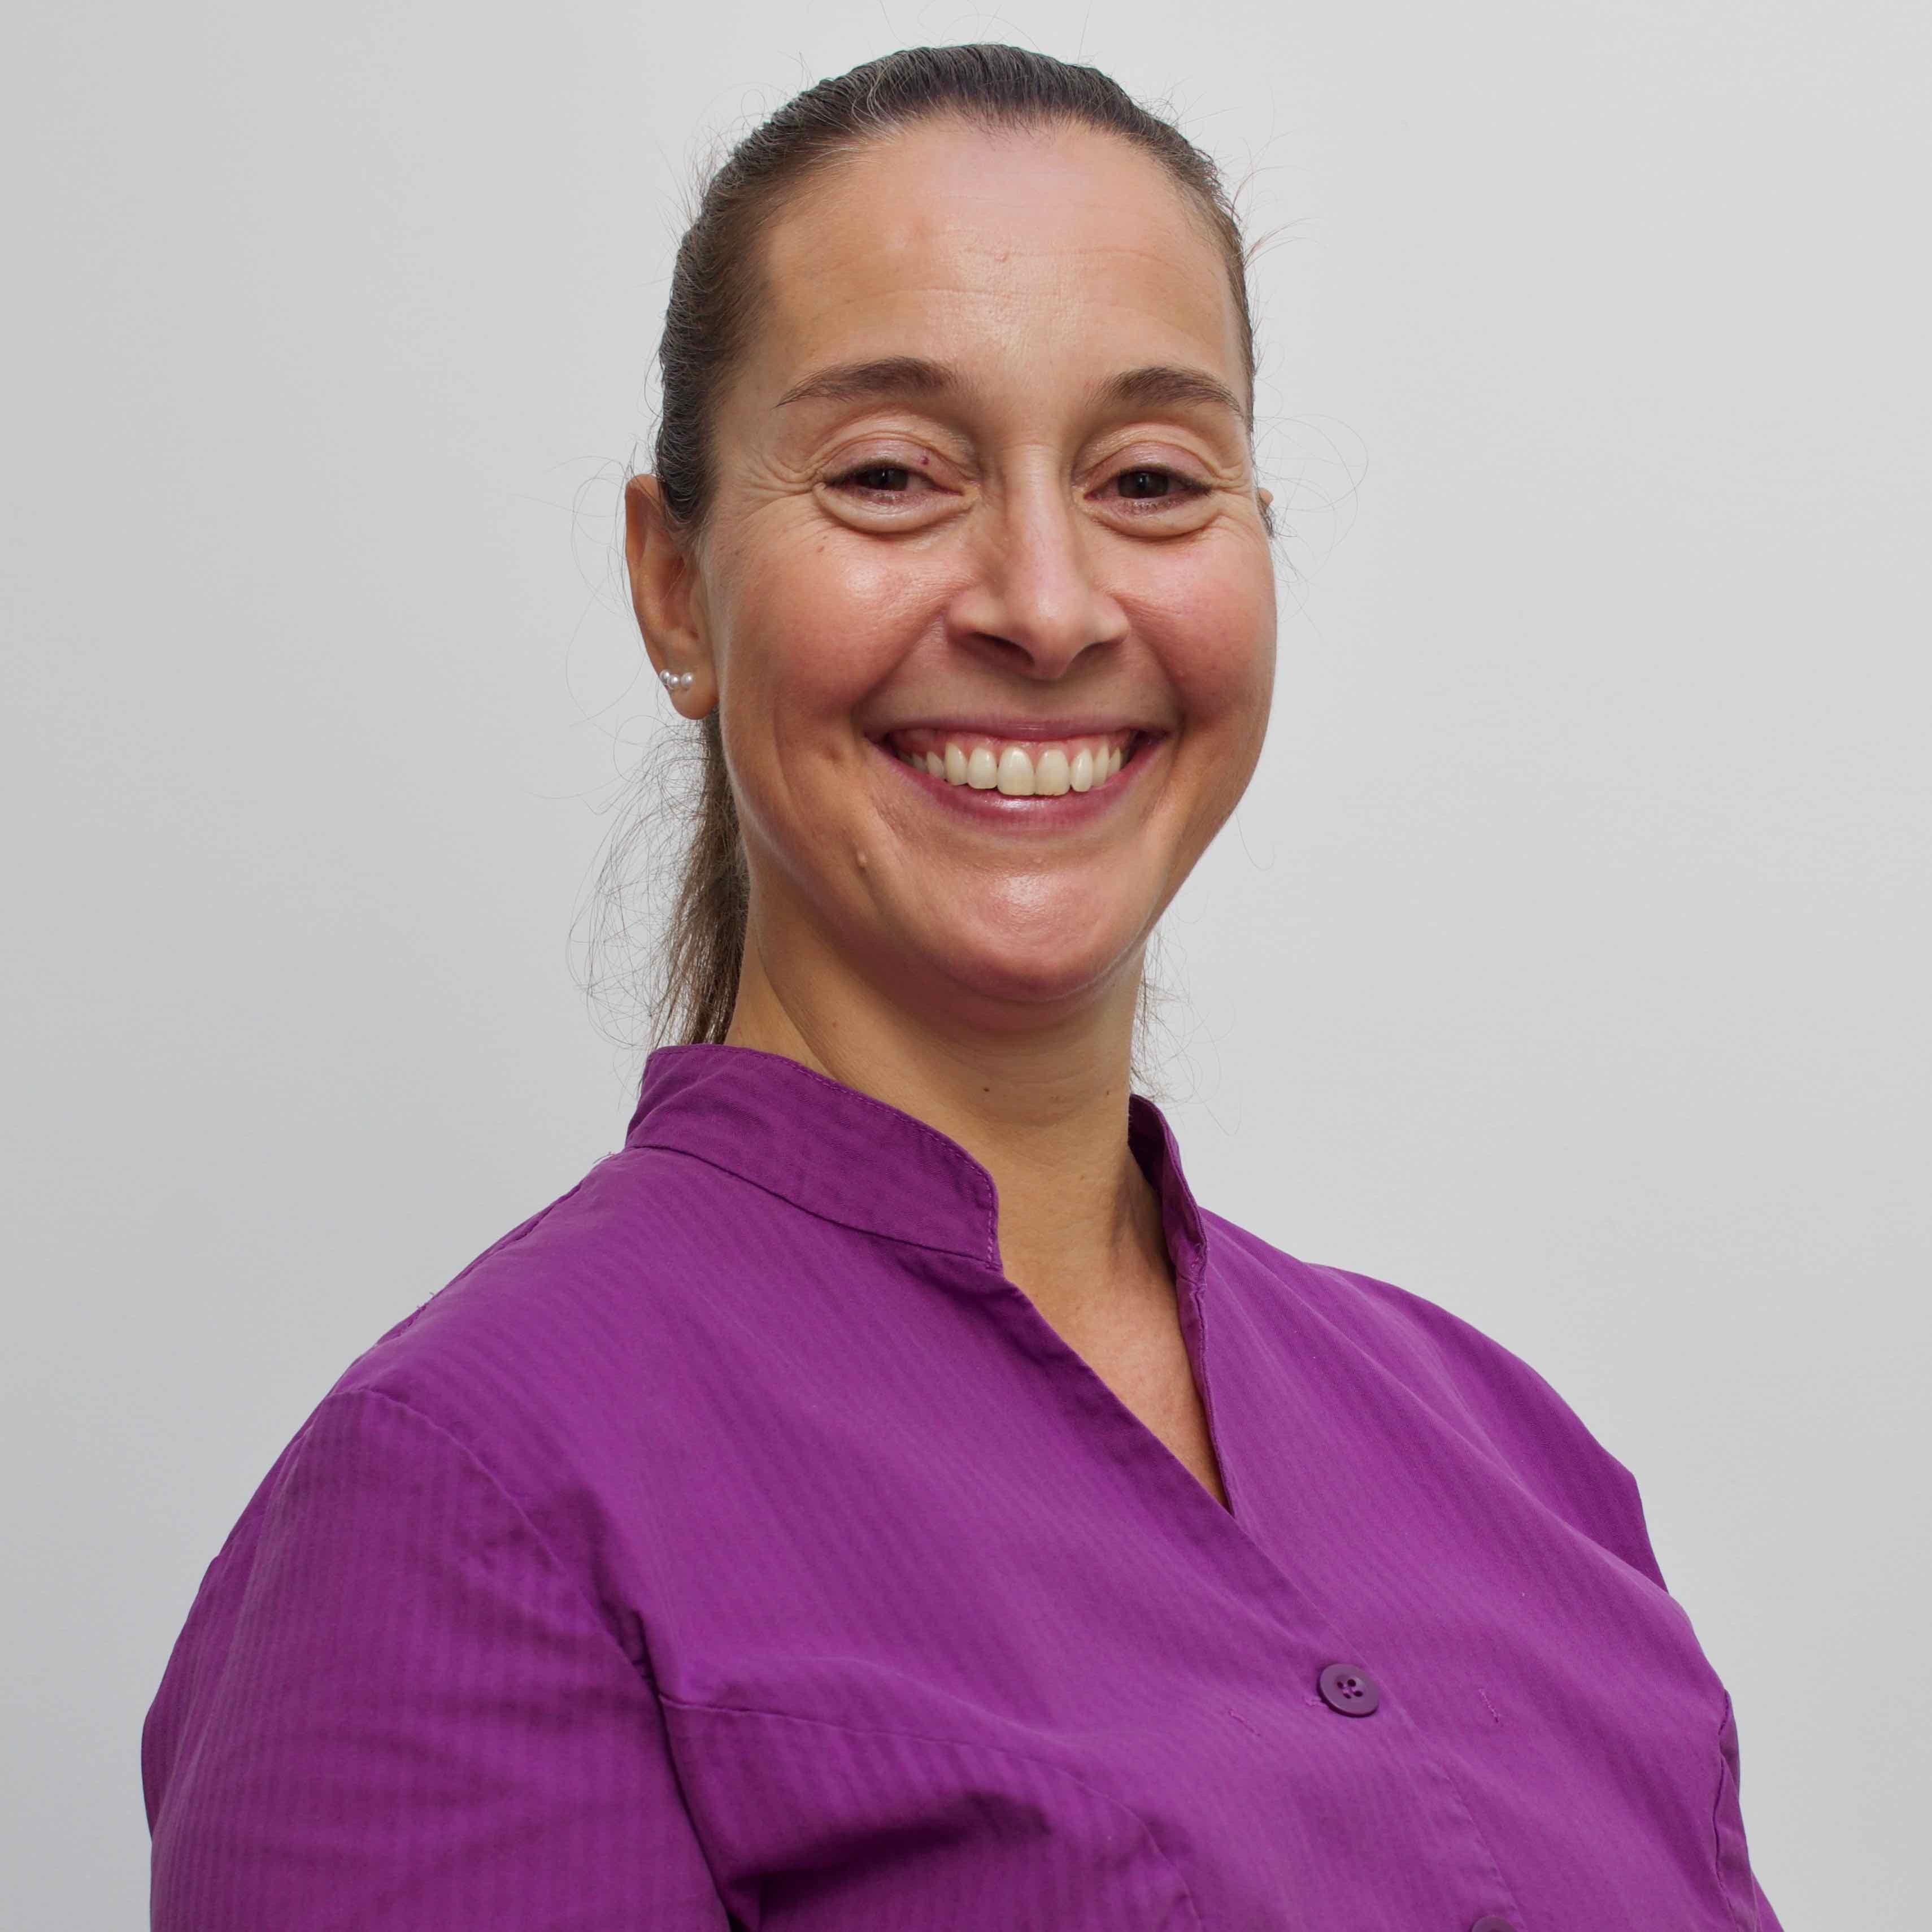 Saskia Bookelman-Bulterman, tandarts